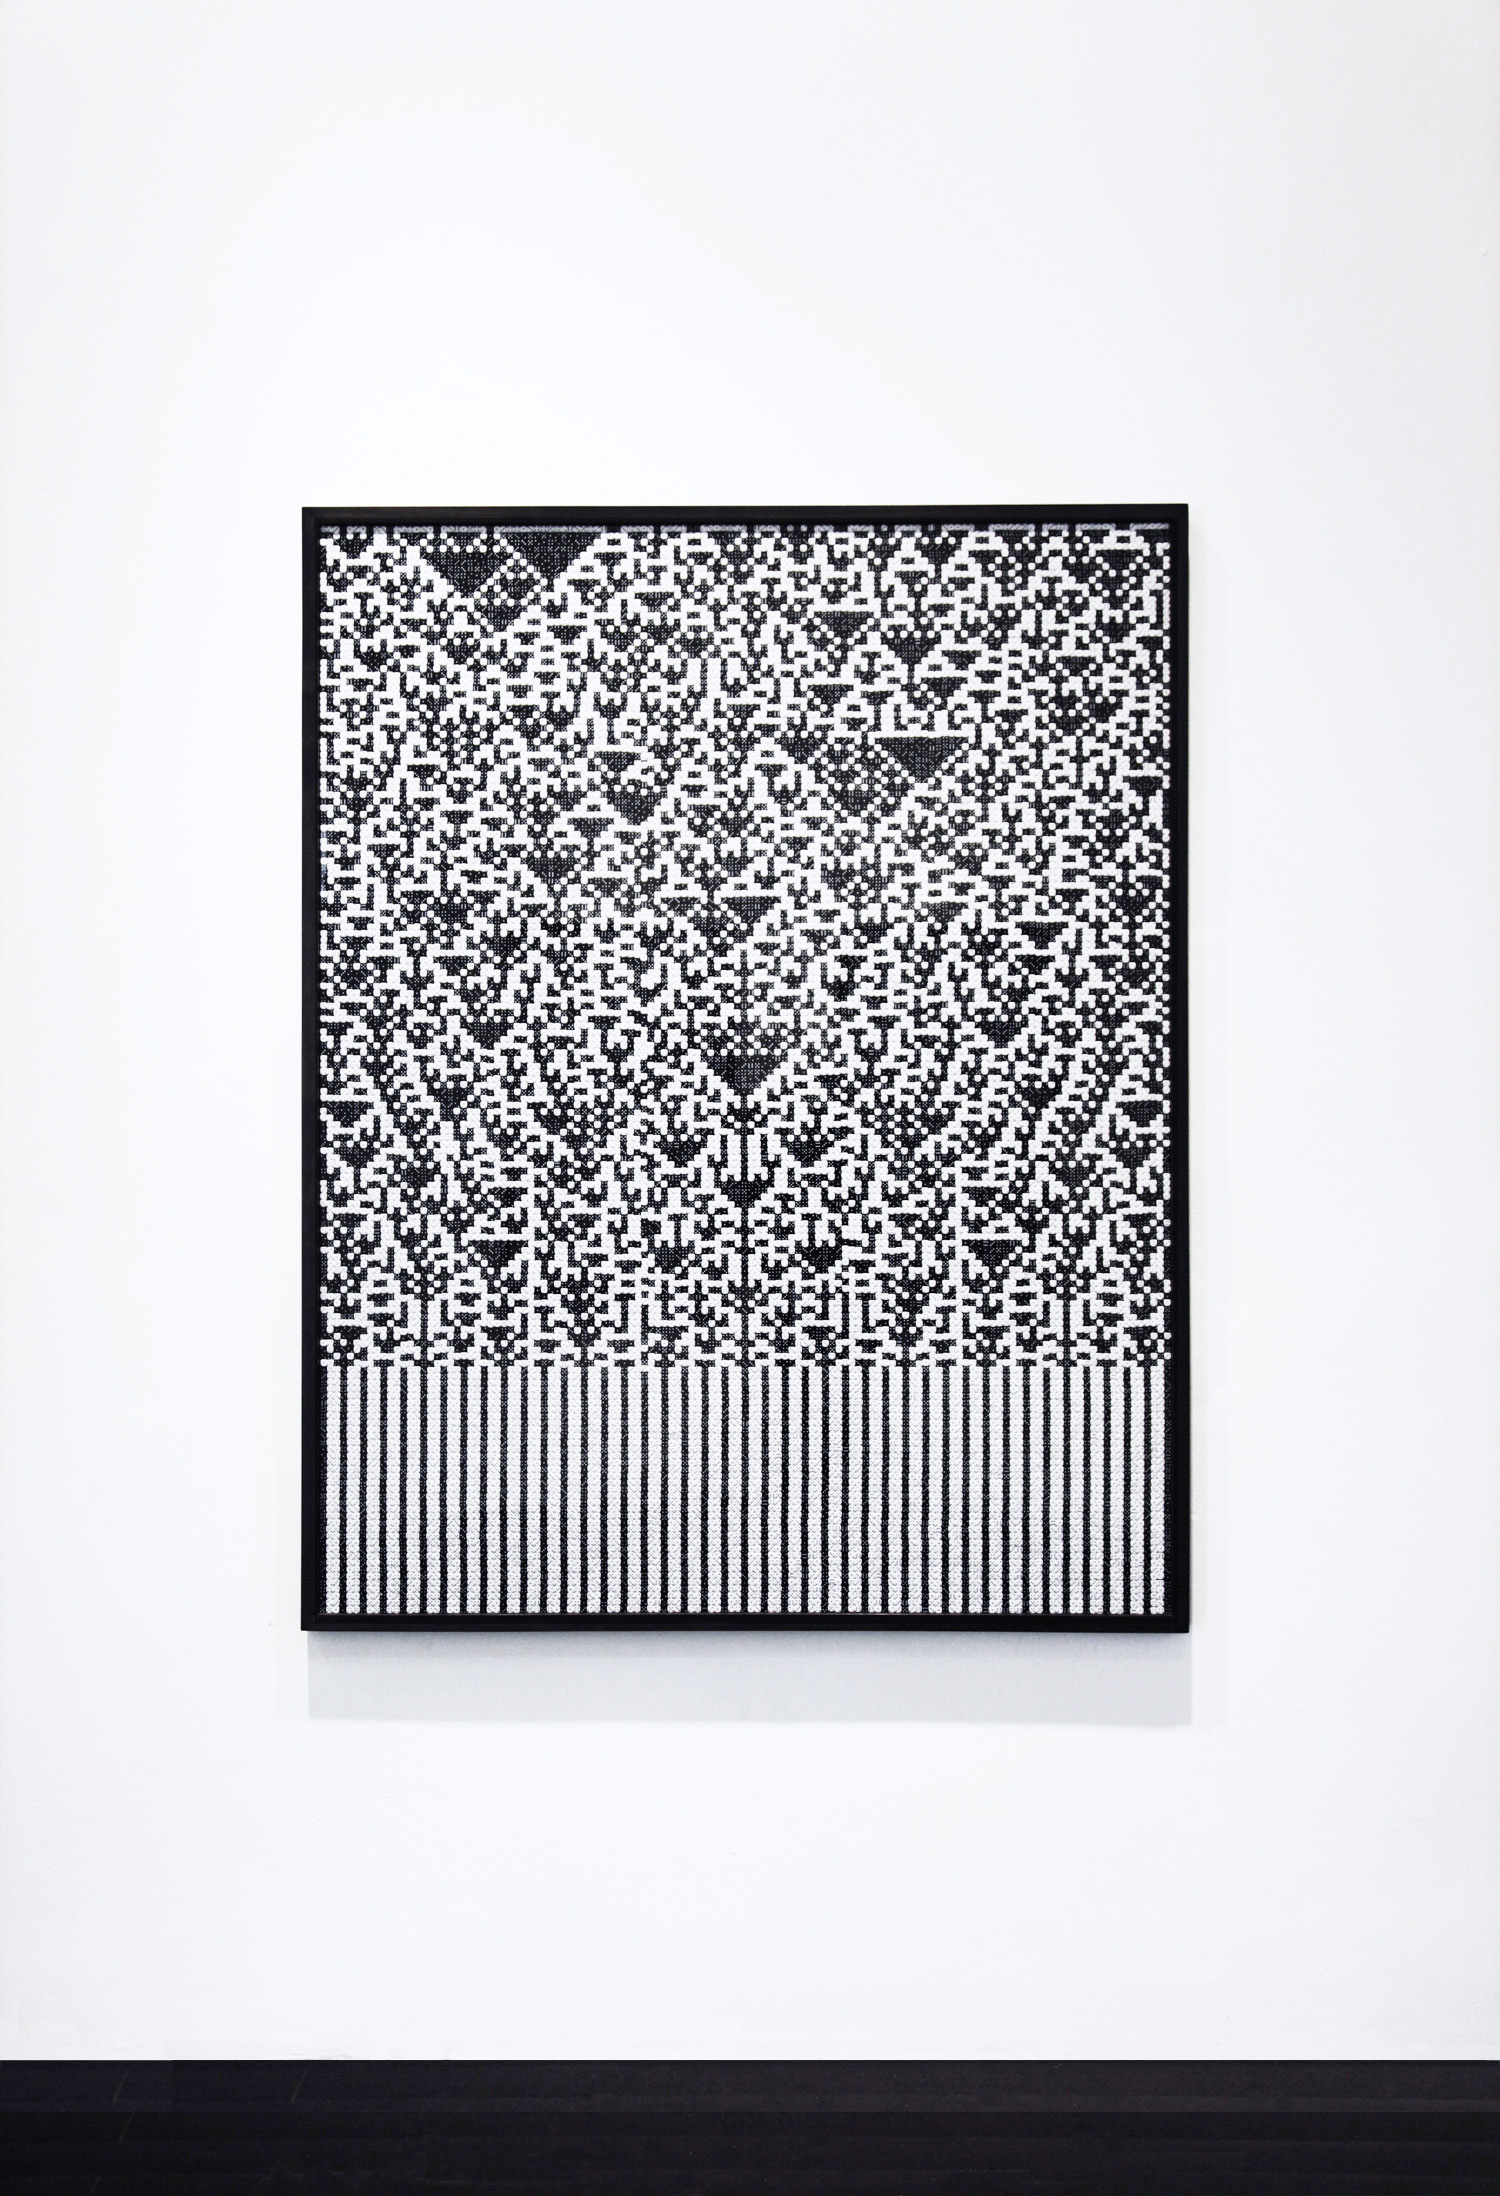 'Hierophany', 2013 | Troika (Eva Rucki, Sebastien Noel, Conny Freyer)